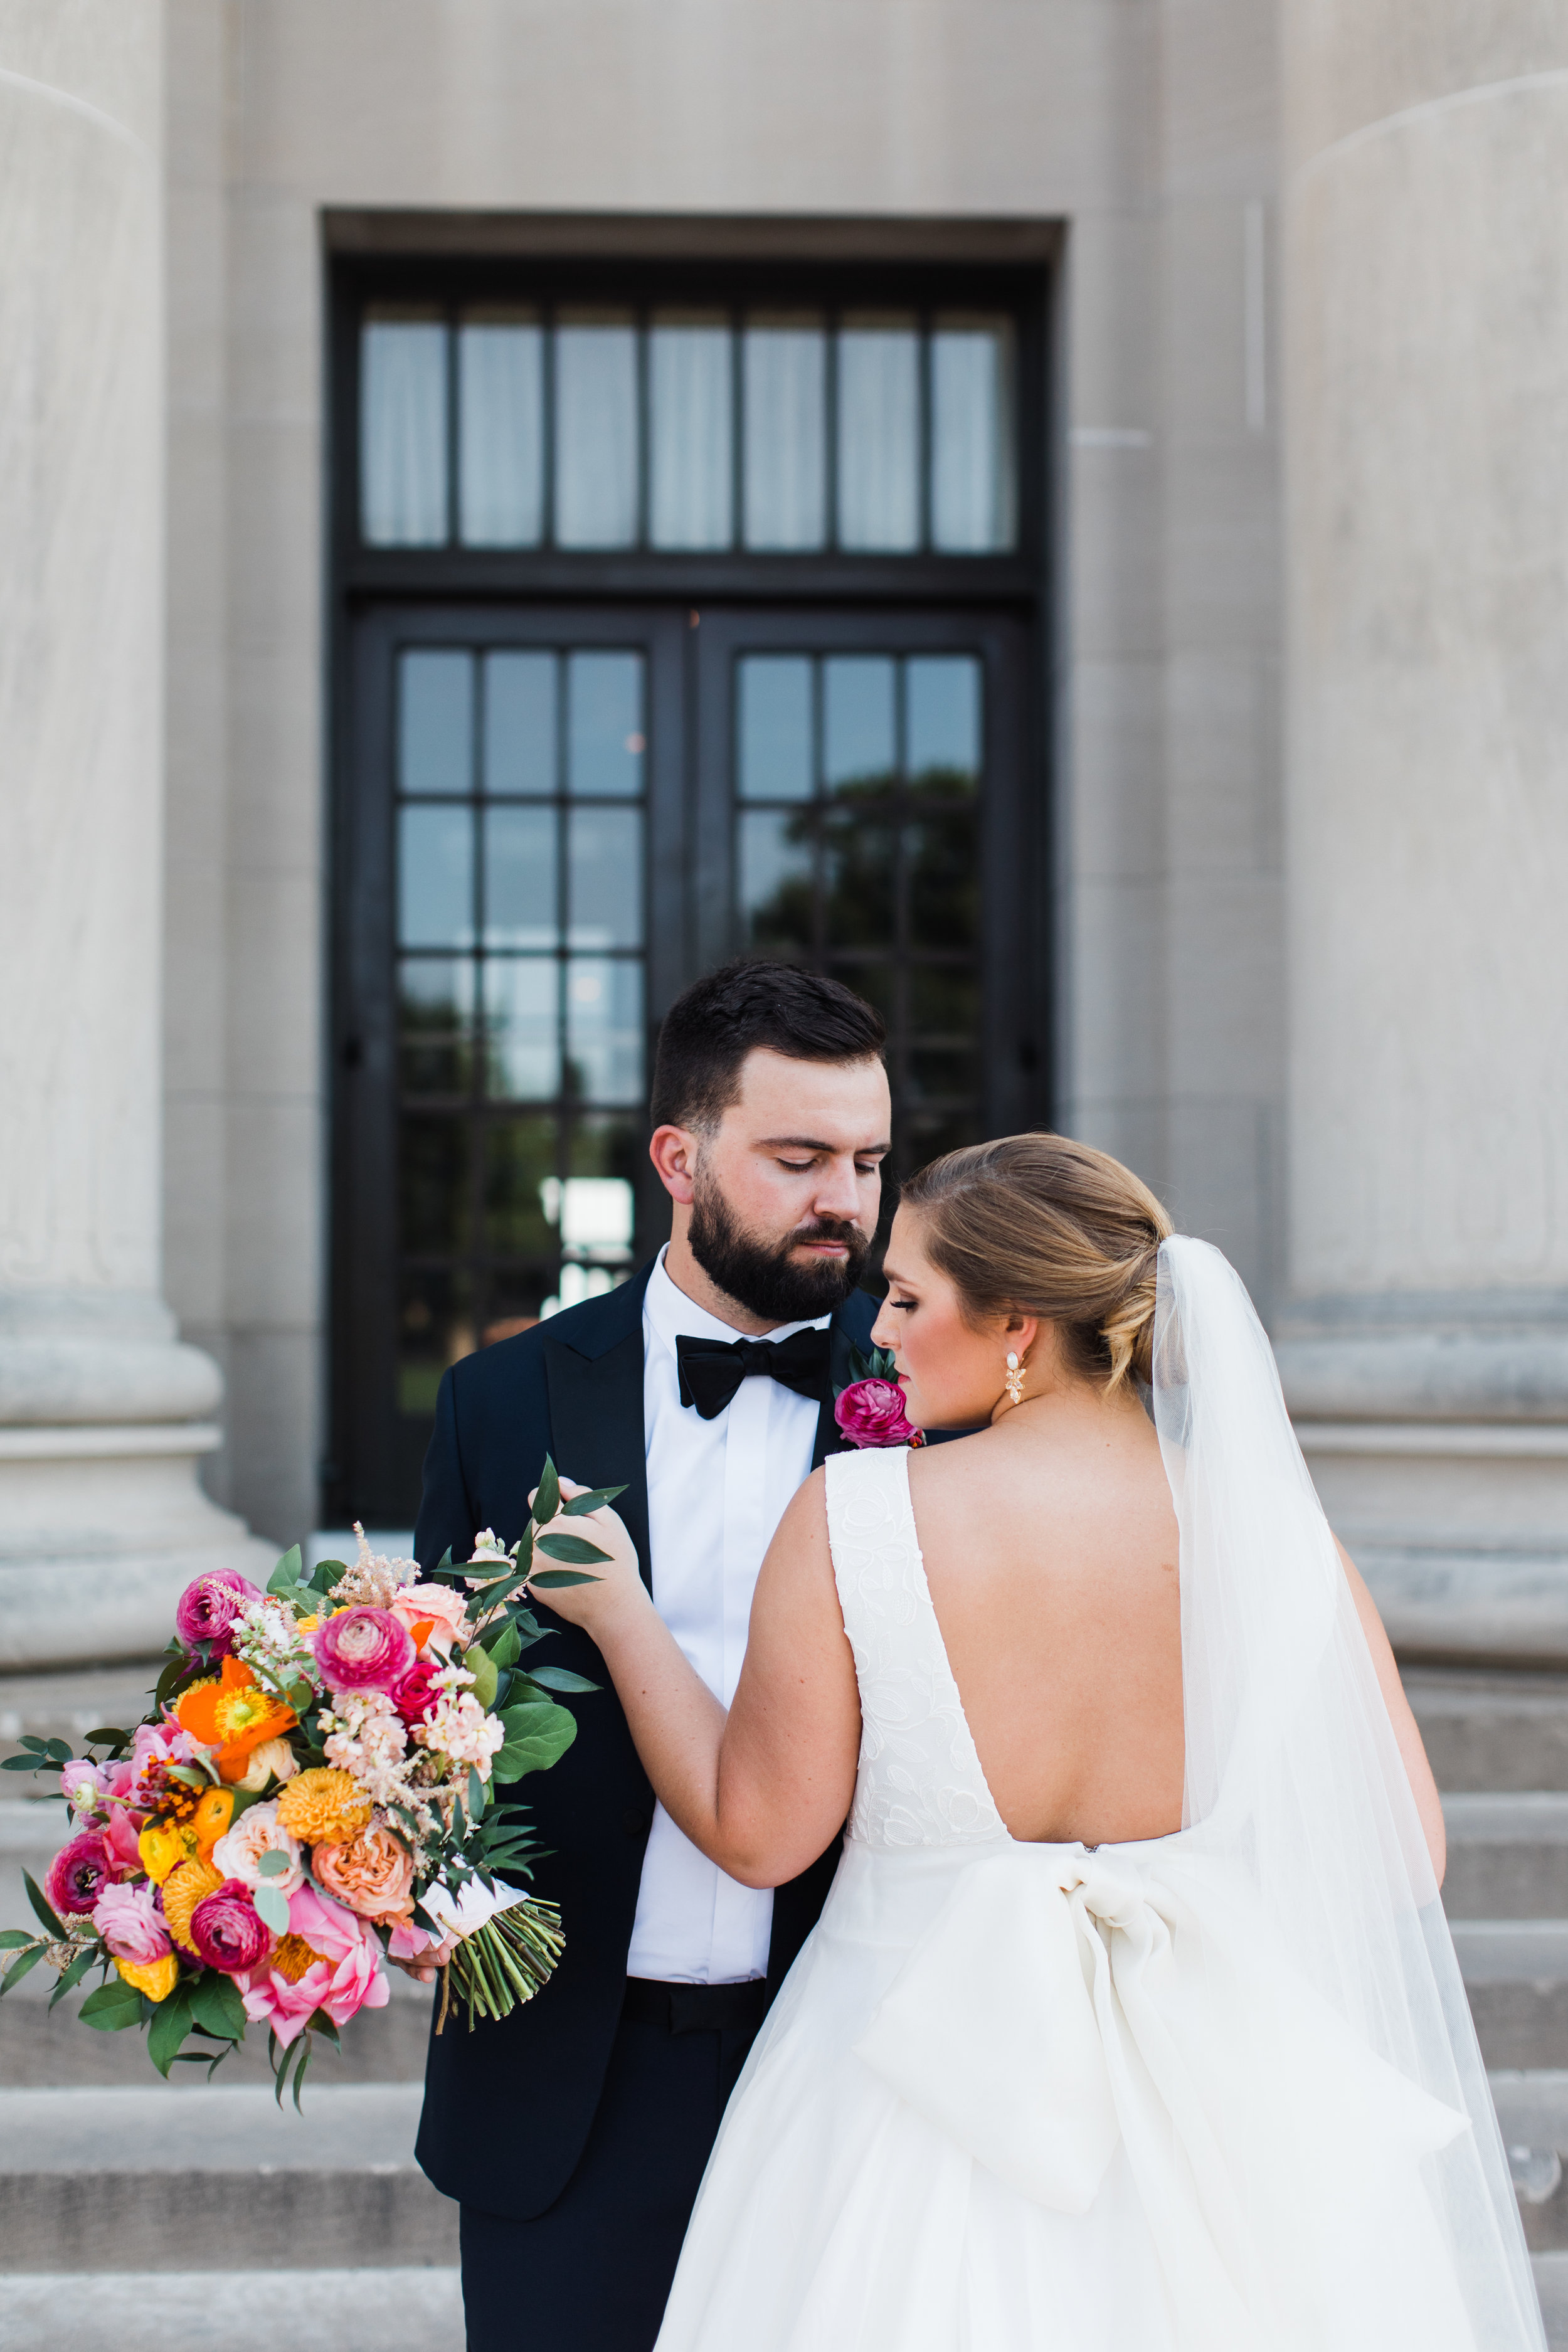 KLIMES WEDDING - MARISSA CRIBBS PHOTOGRAPHY-623.jpg